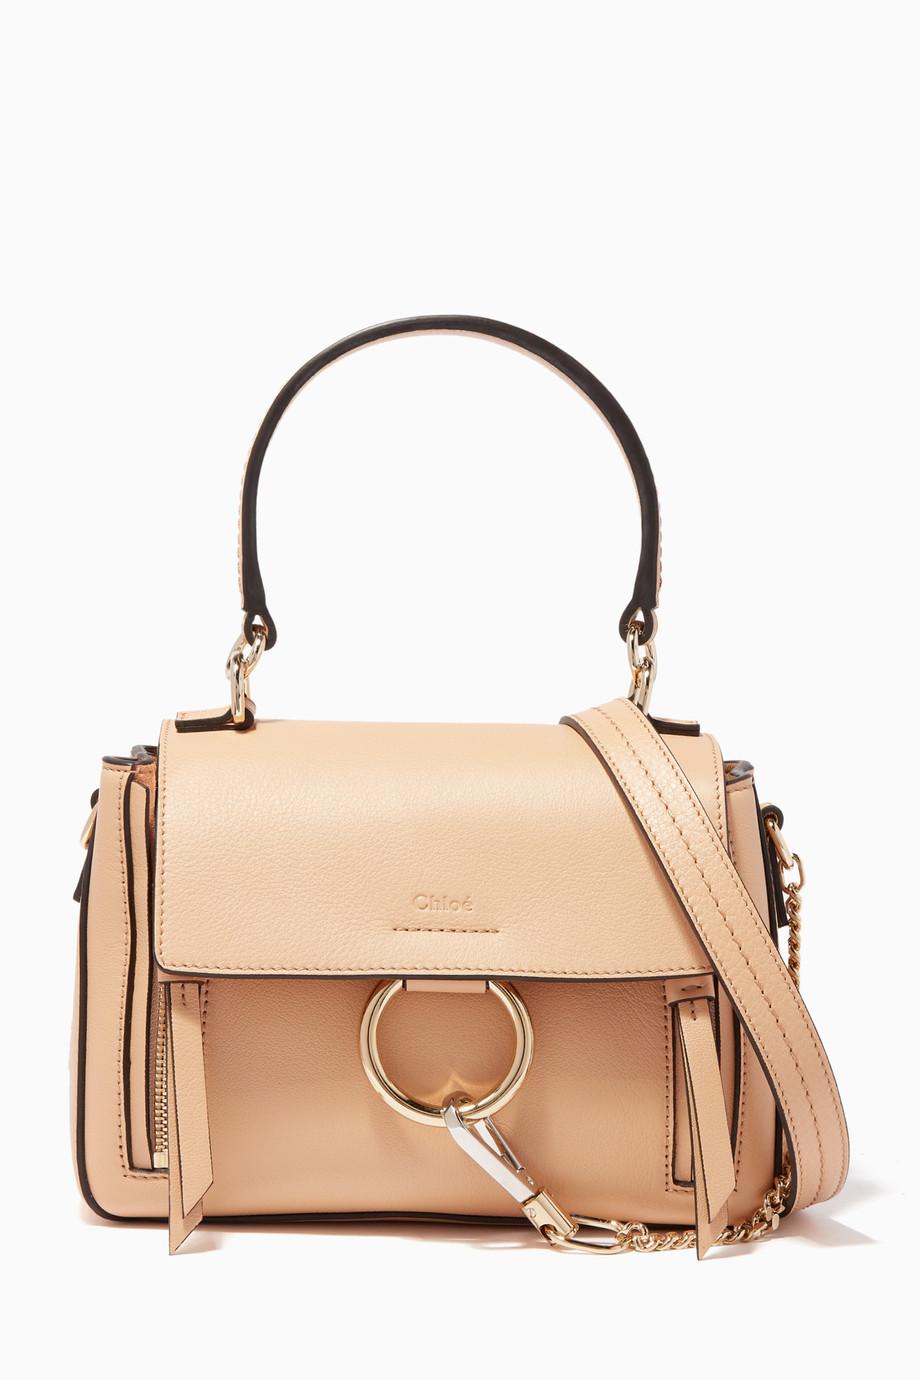 ddfac356f76db تسوق حقيبة فايي صغيرة Chloé وردي للنساء